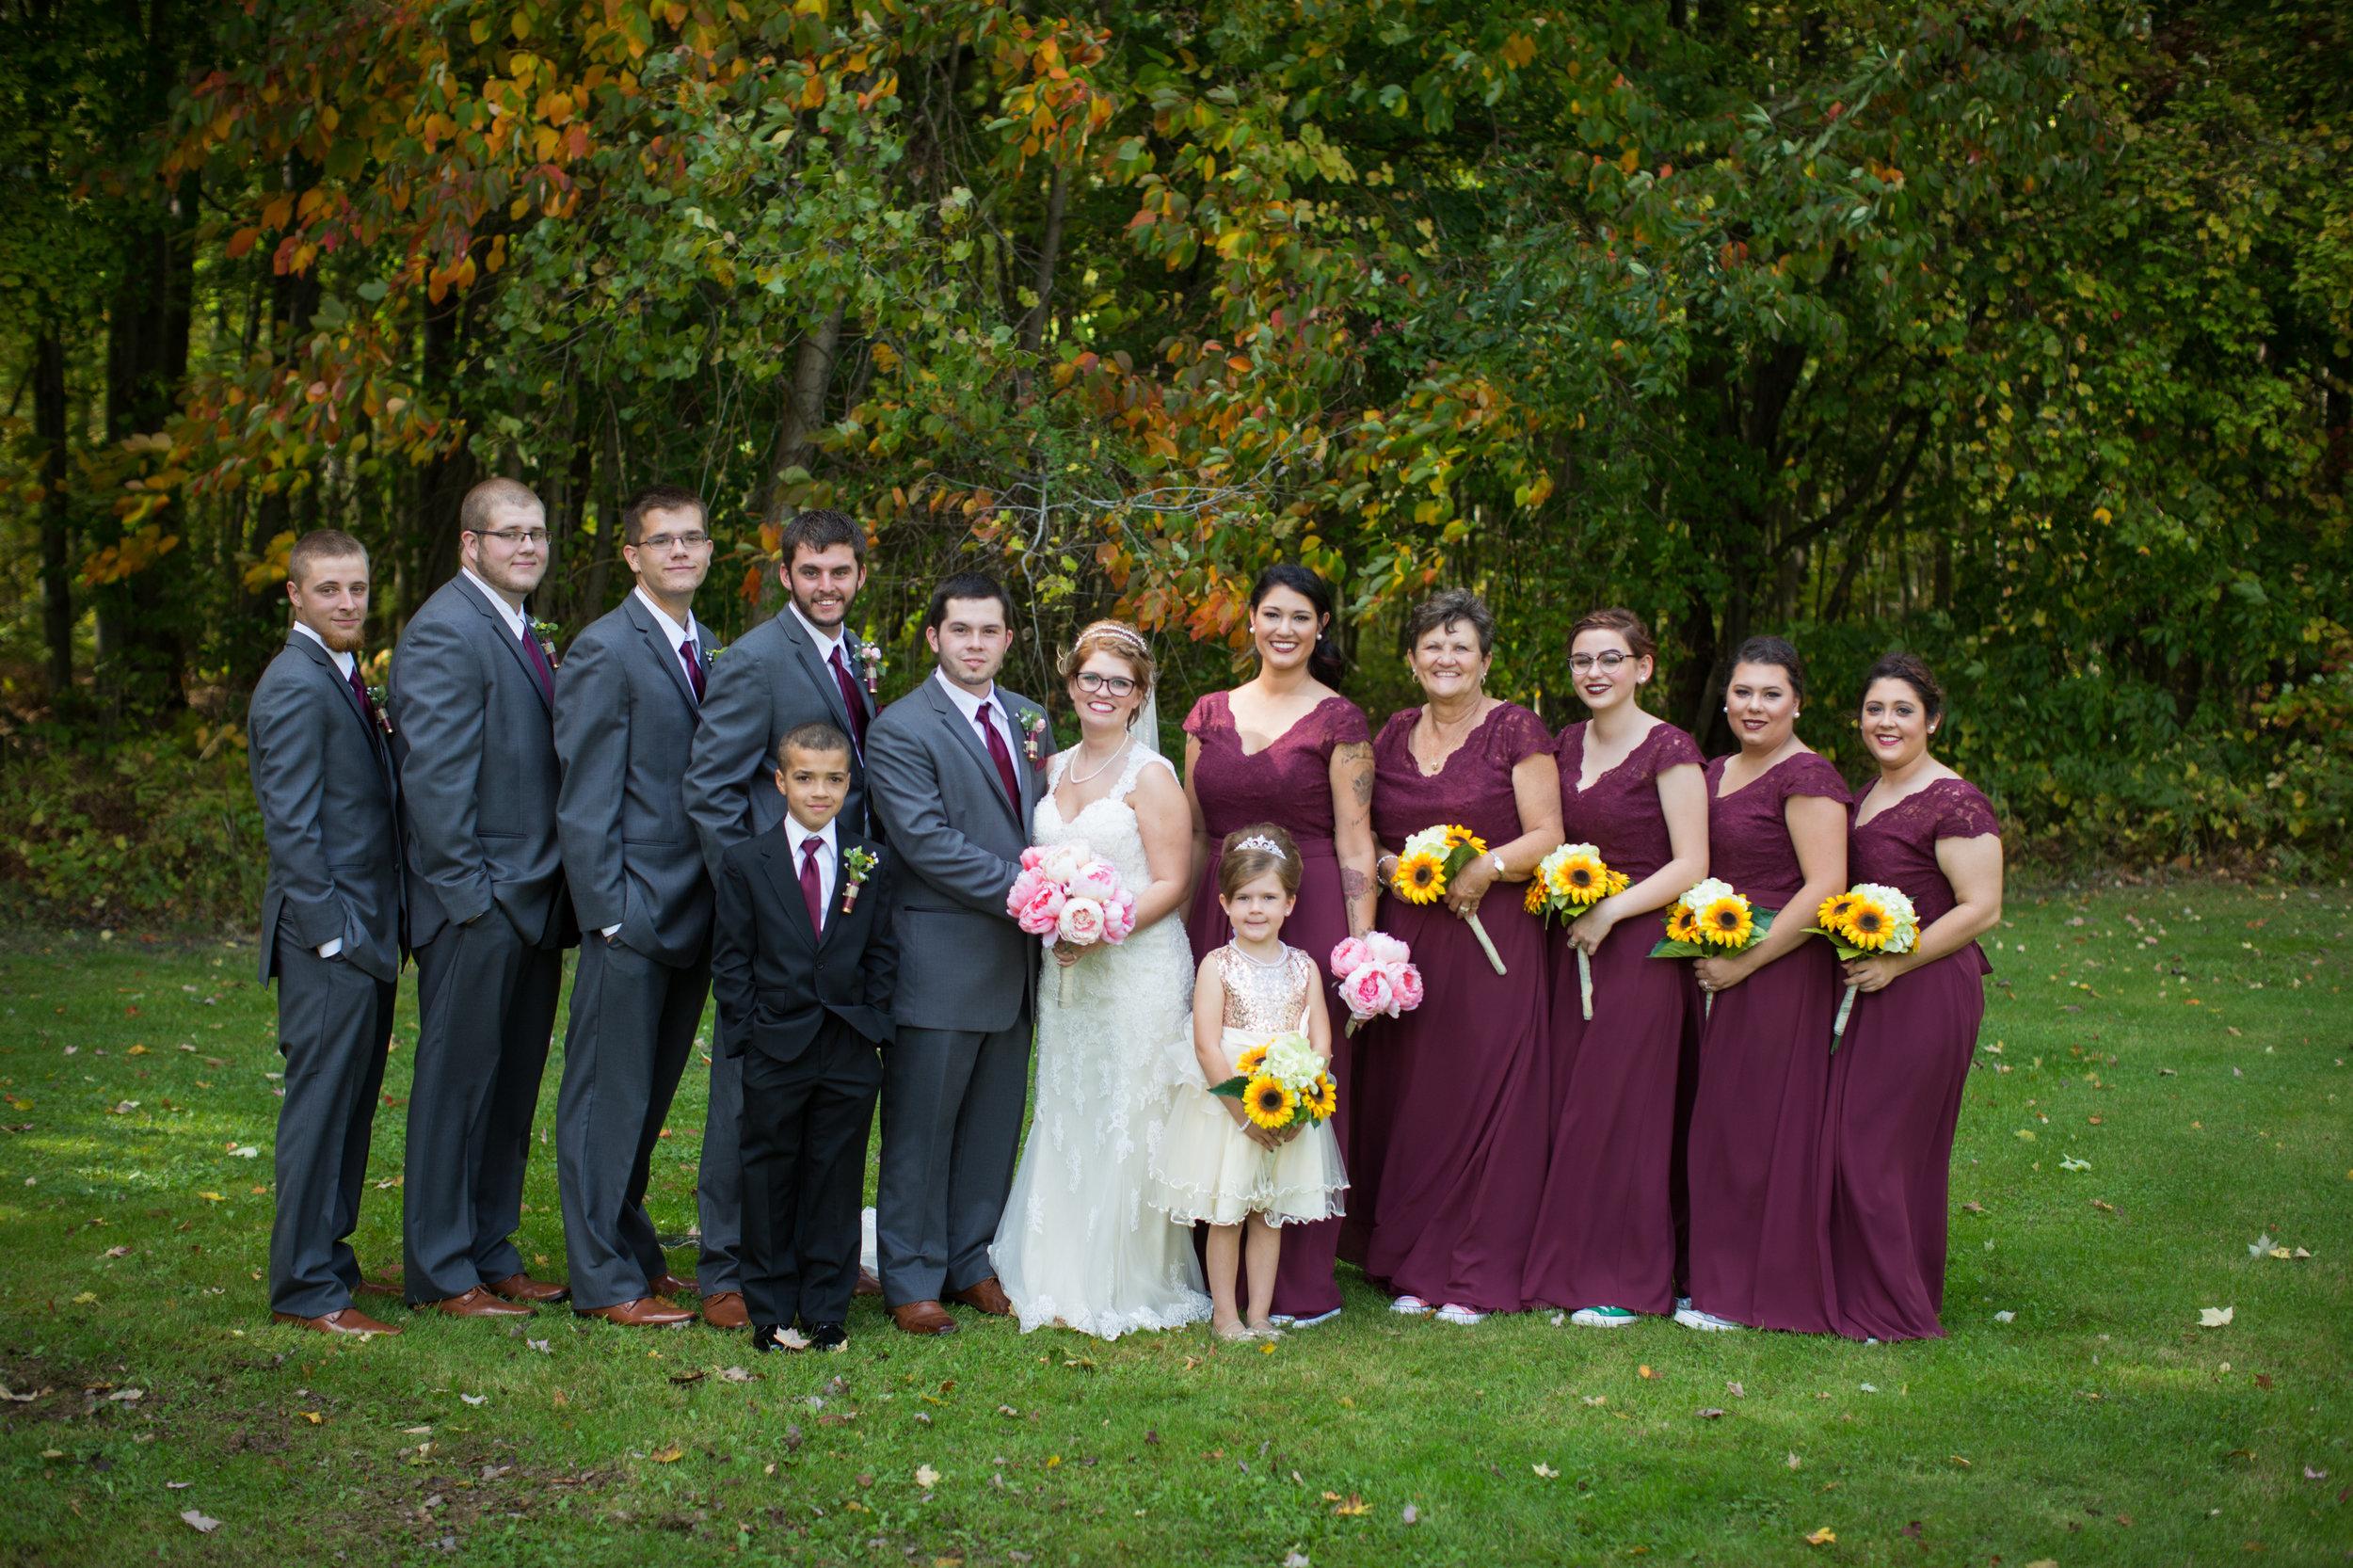 bridal party posing for Michigan wedding photographer during wedding photos